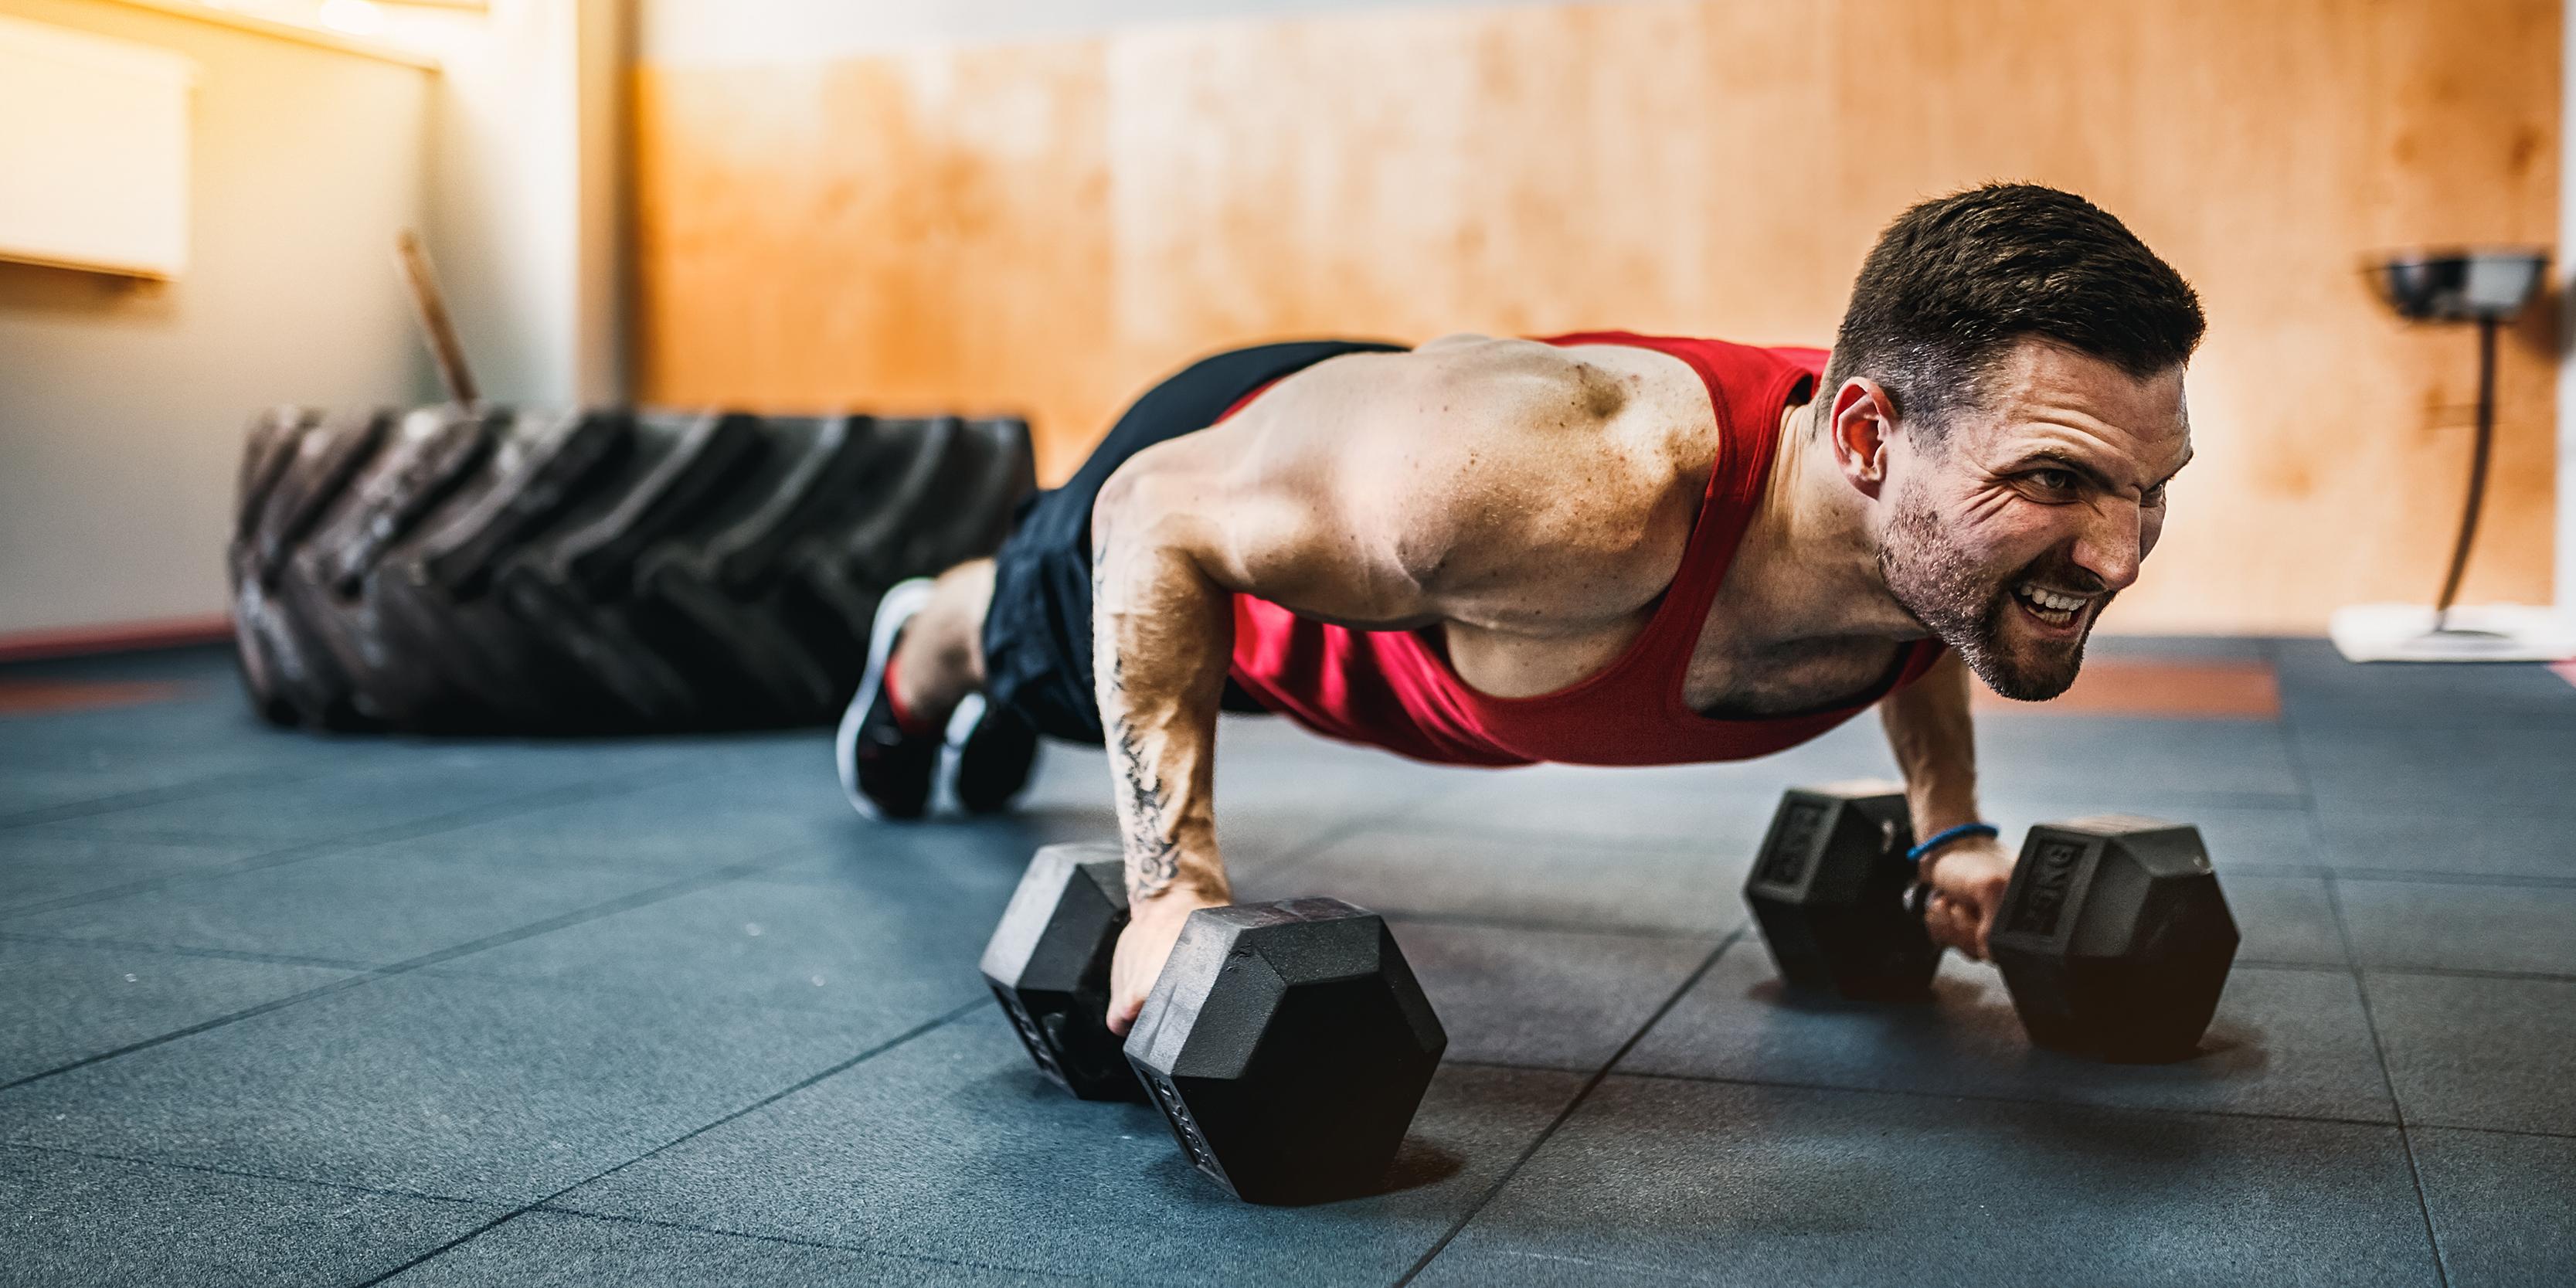 How_to_set_fitness_goals_04.jpeg